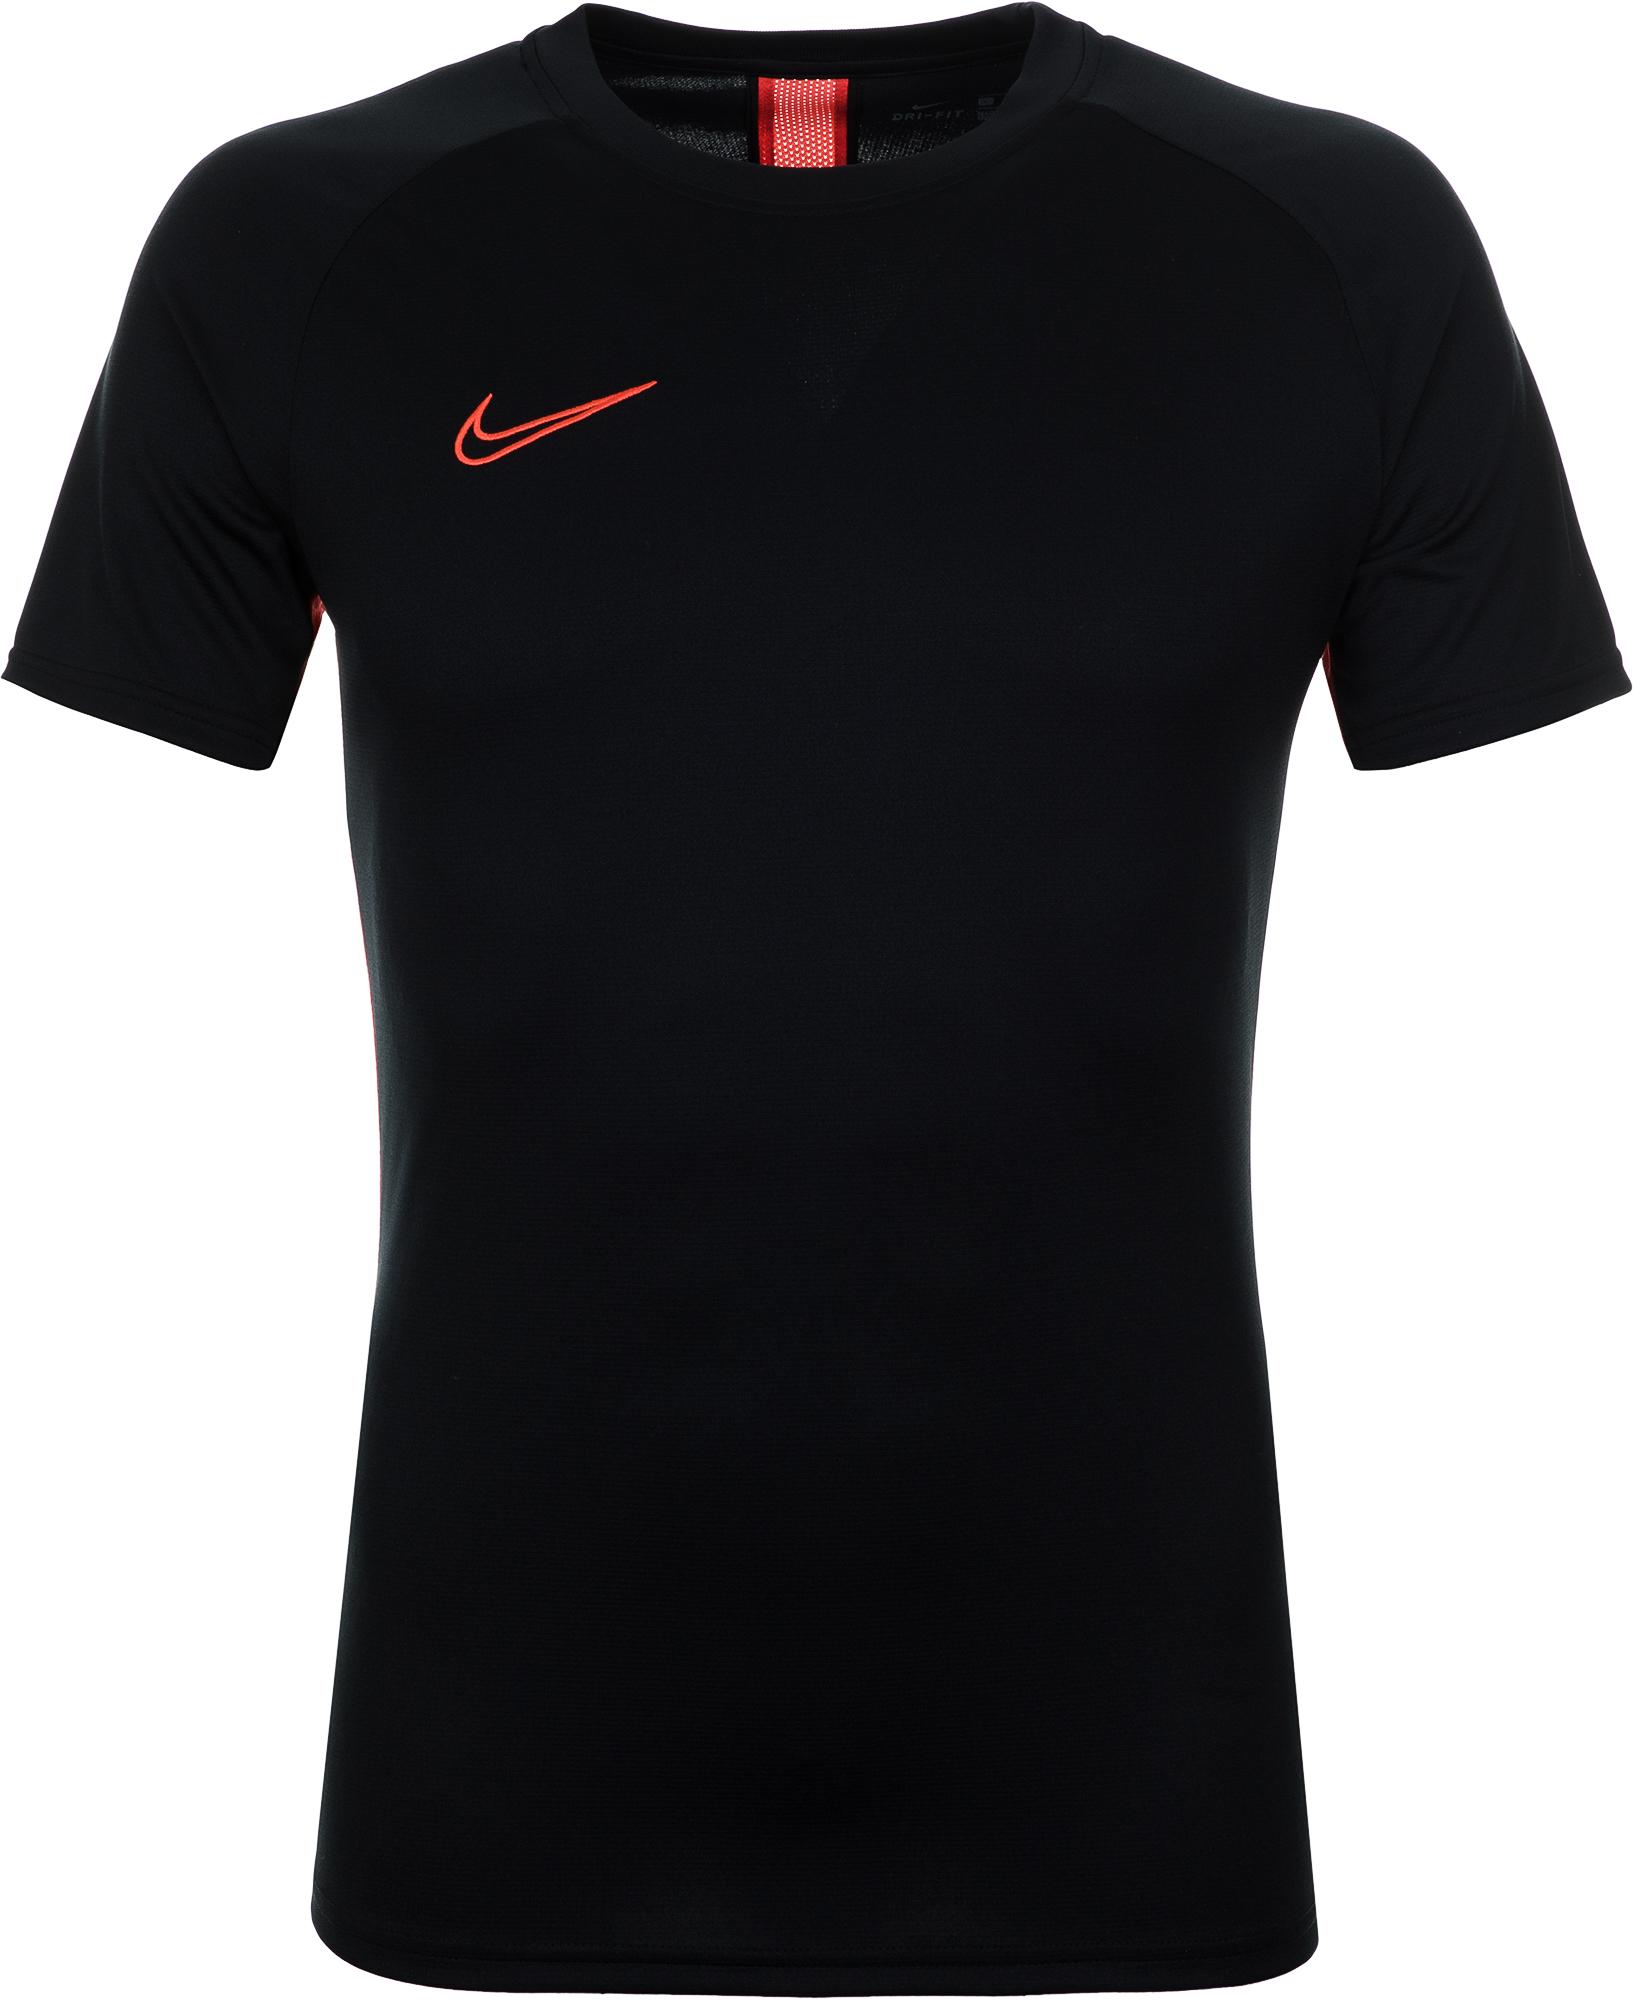 Nike Футболка мужская Nike Academy, размер 50-52